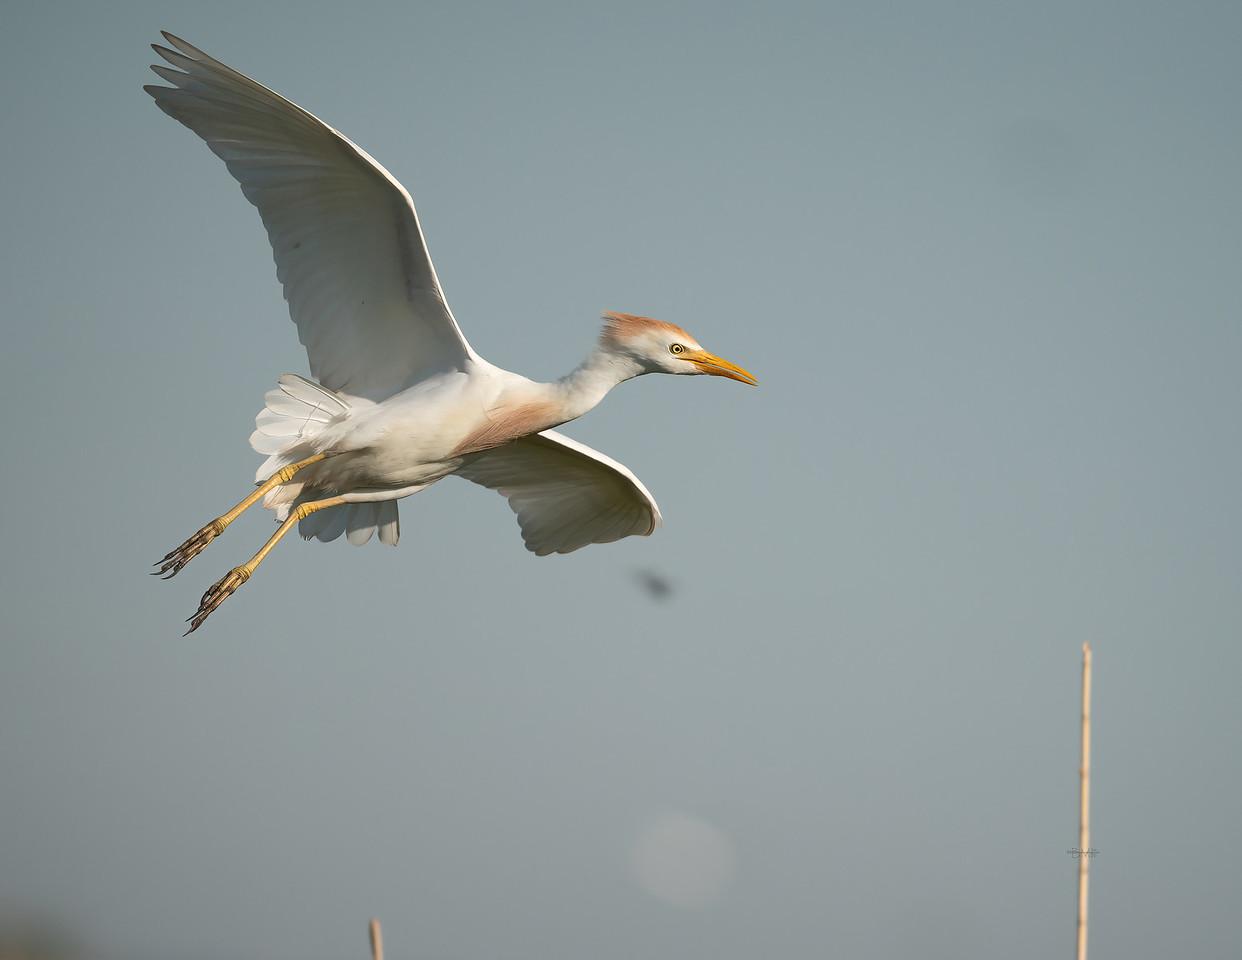 IMAGE: https://photos.smugmug.com/Beautyinthetreesandintheair/Herons-egrets-and-other-large-wading-birds/i-MXdTnPM/0/5cd03421/X2/Cattle%20egret_9_6-12-2020-39-X2.jpg